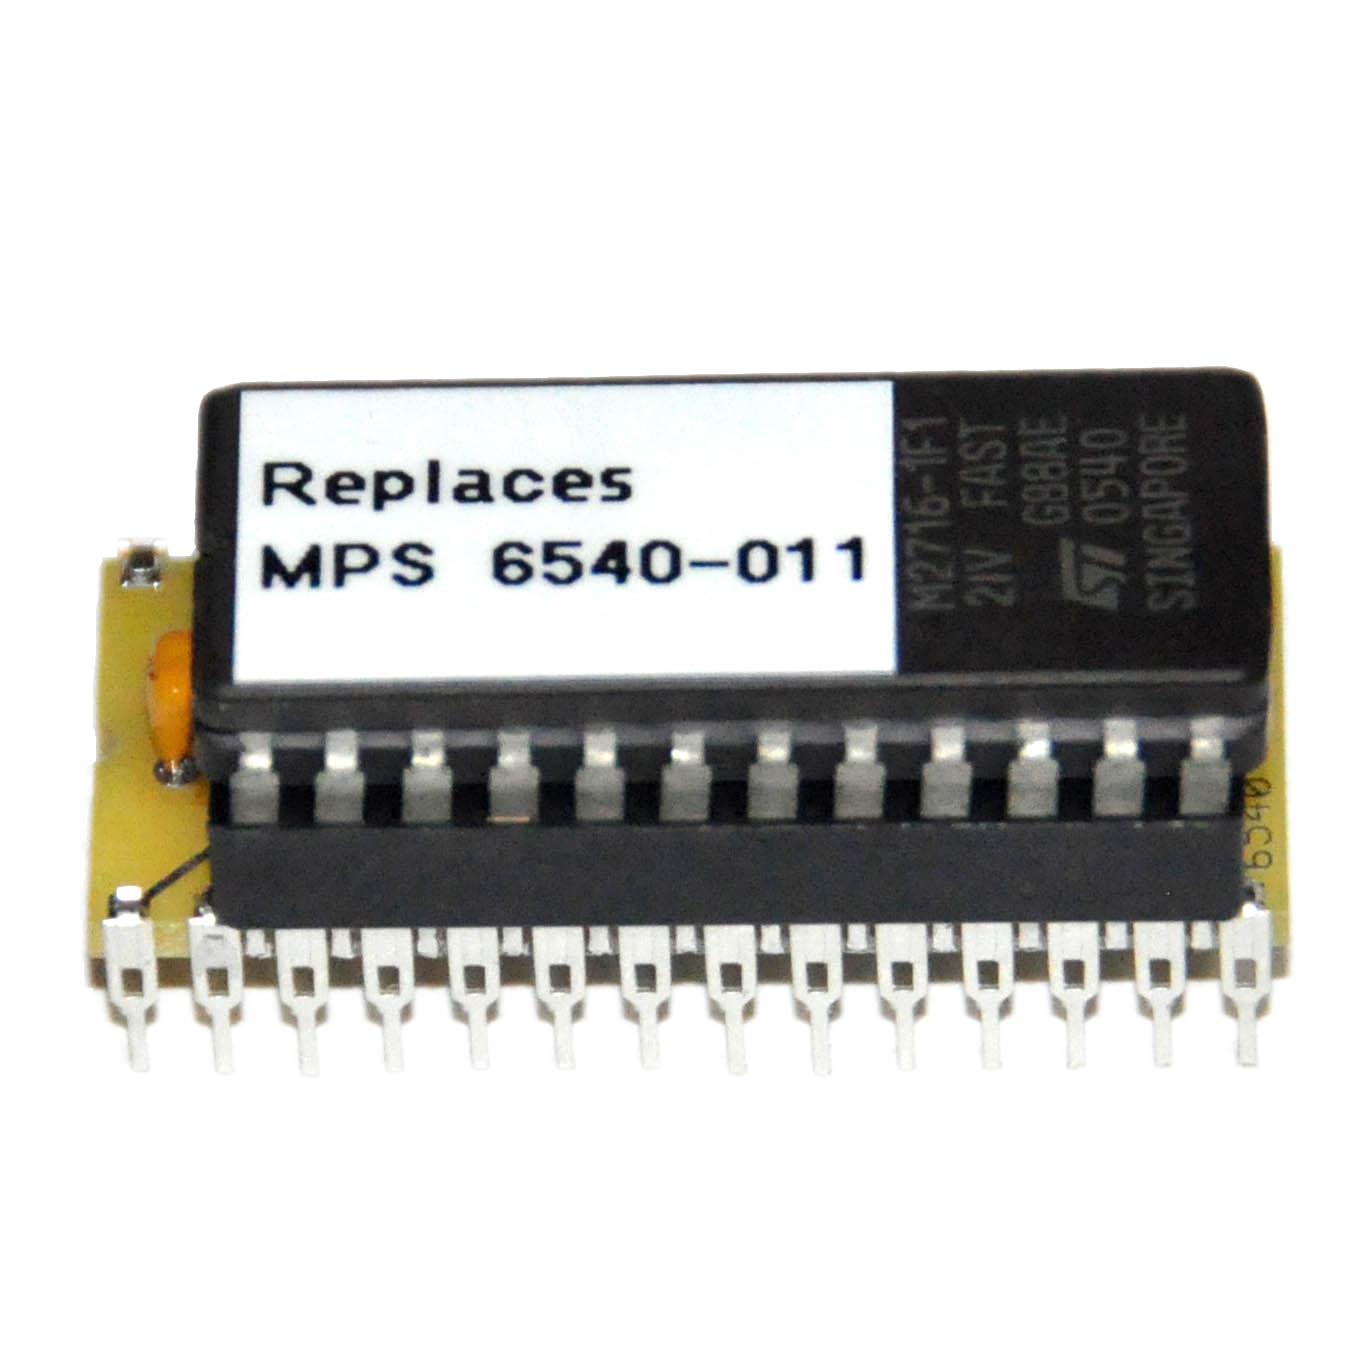 Mps 6540 Commodore Pet 2001 Rom Adapter Obsolete Rev 3 Version Commodorecircuitboardclockjpg